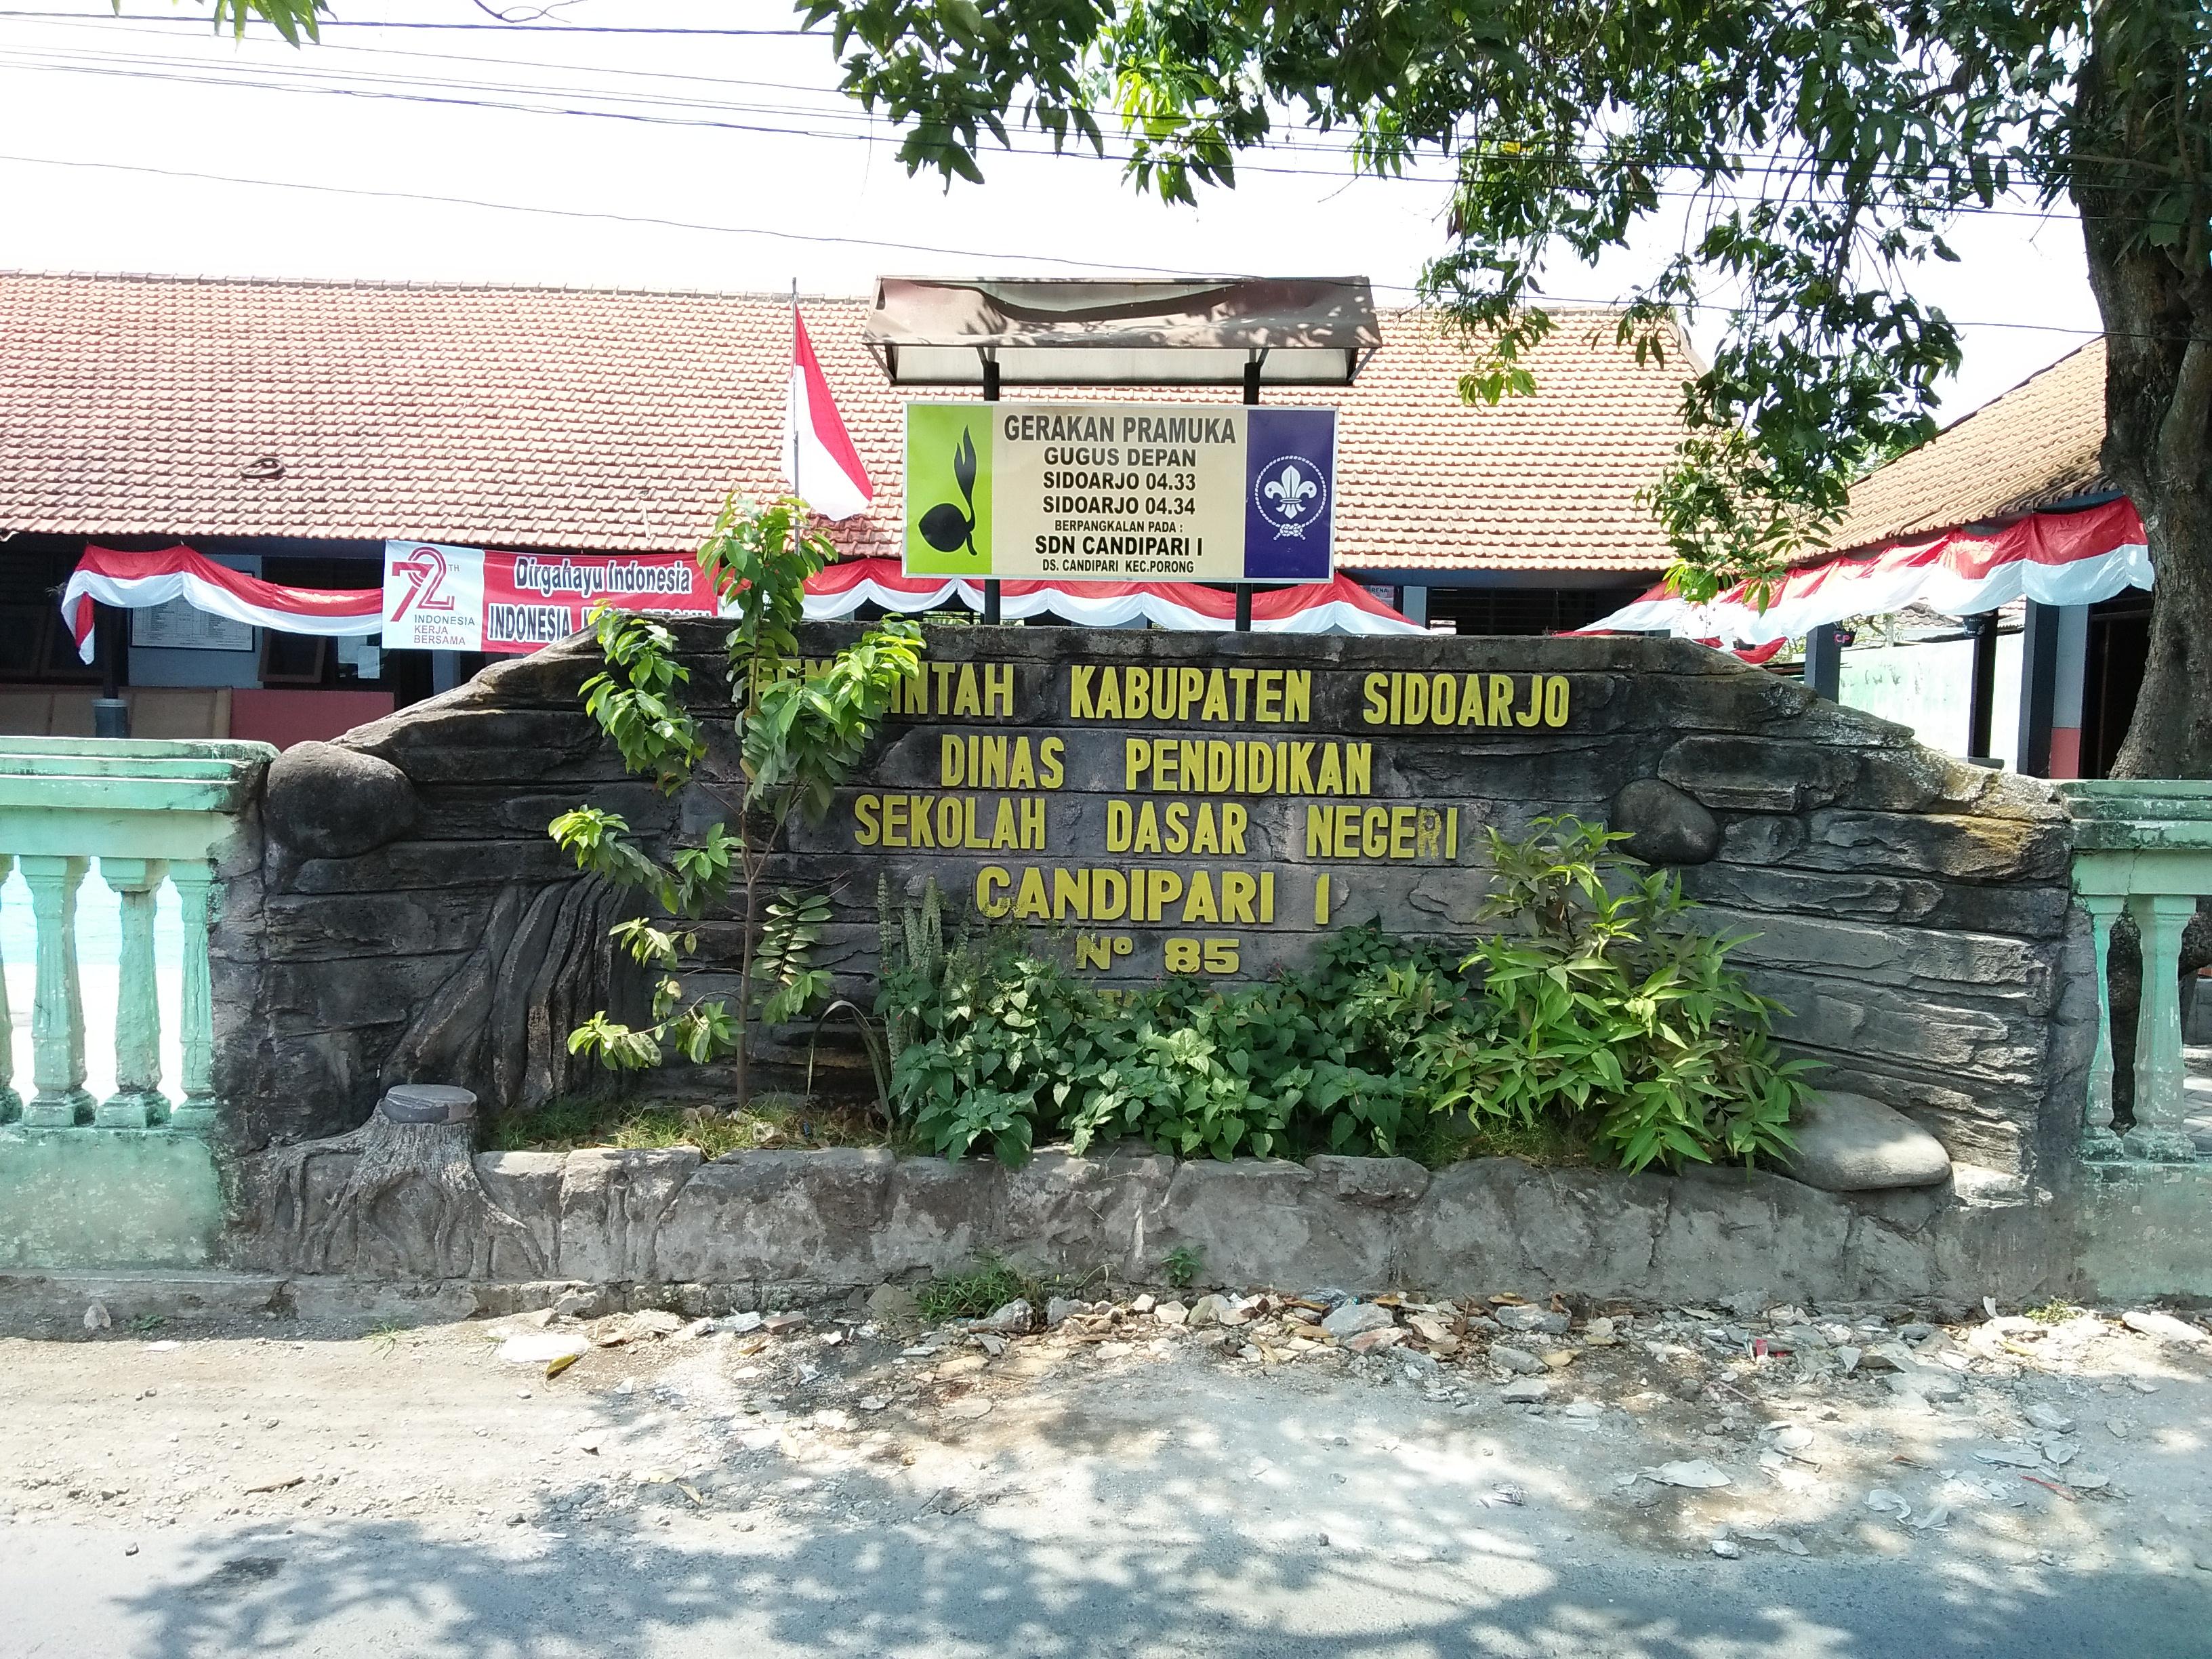 Pendidikan Desa Candi Pari Sd Negeri Candipari 1 Kec Porong